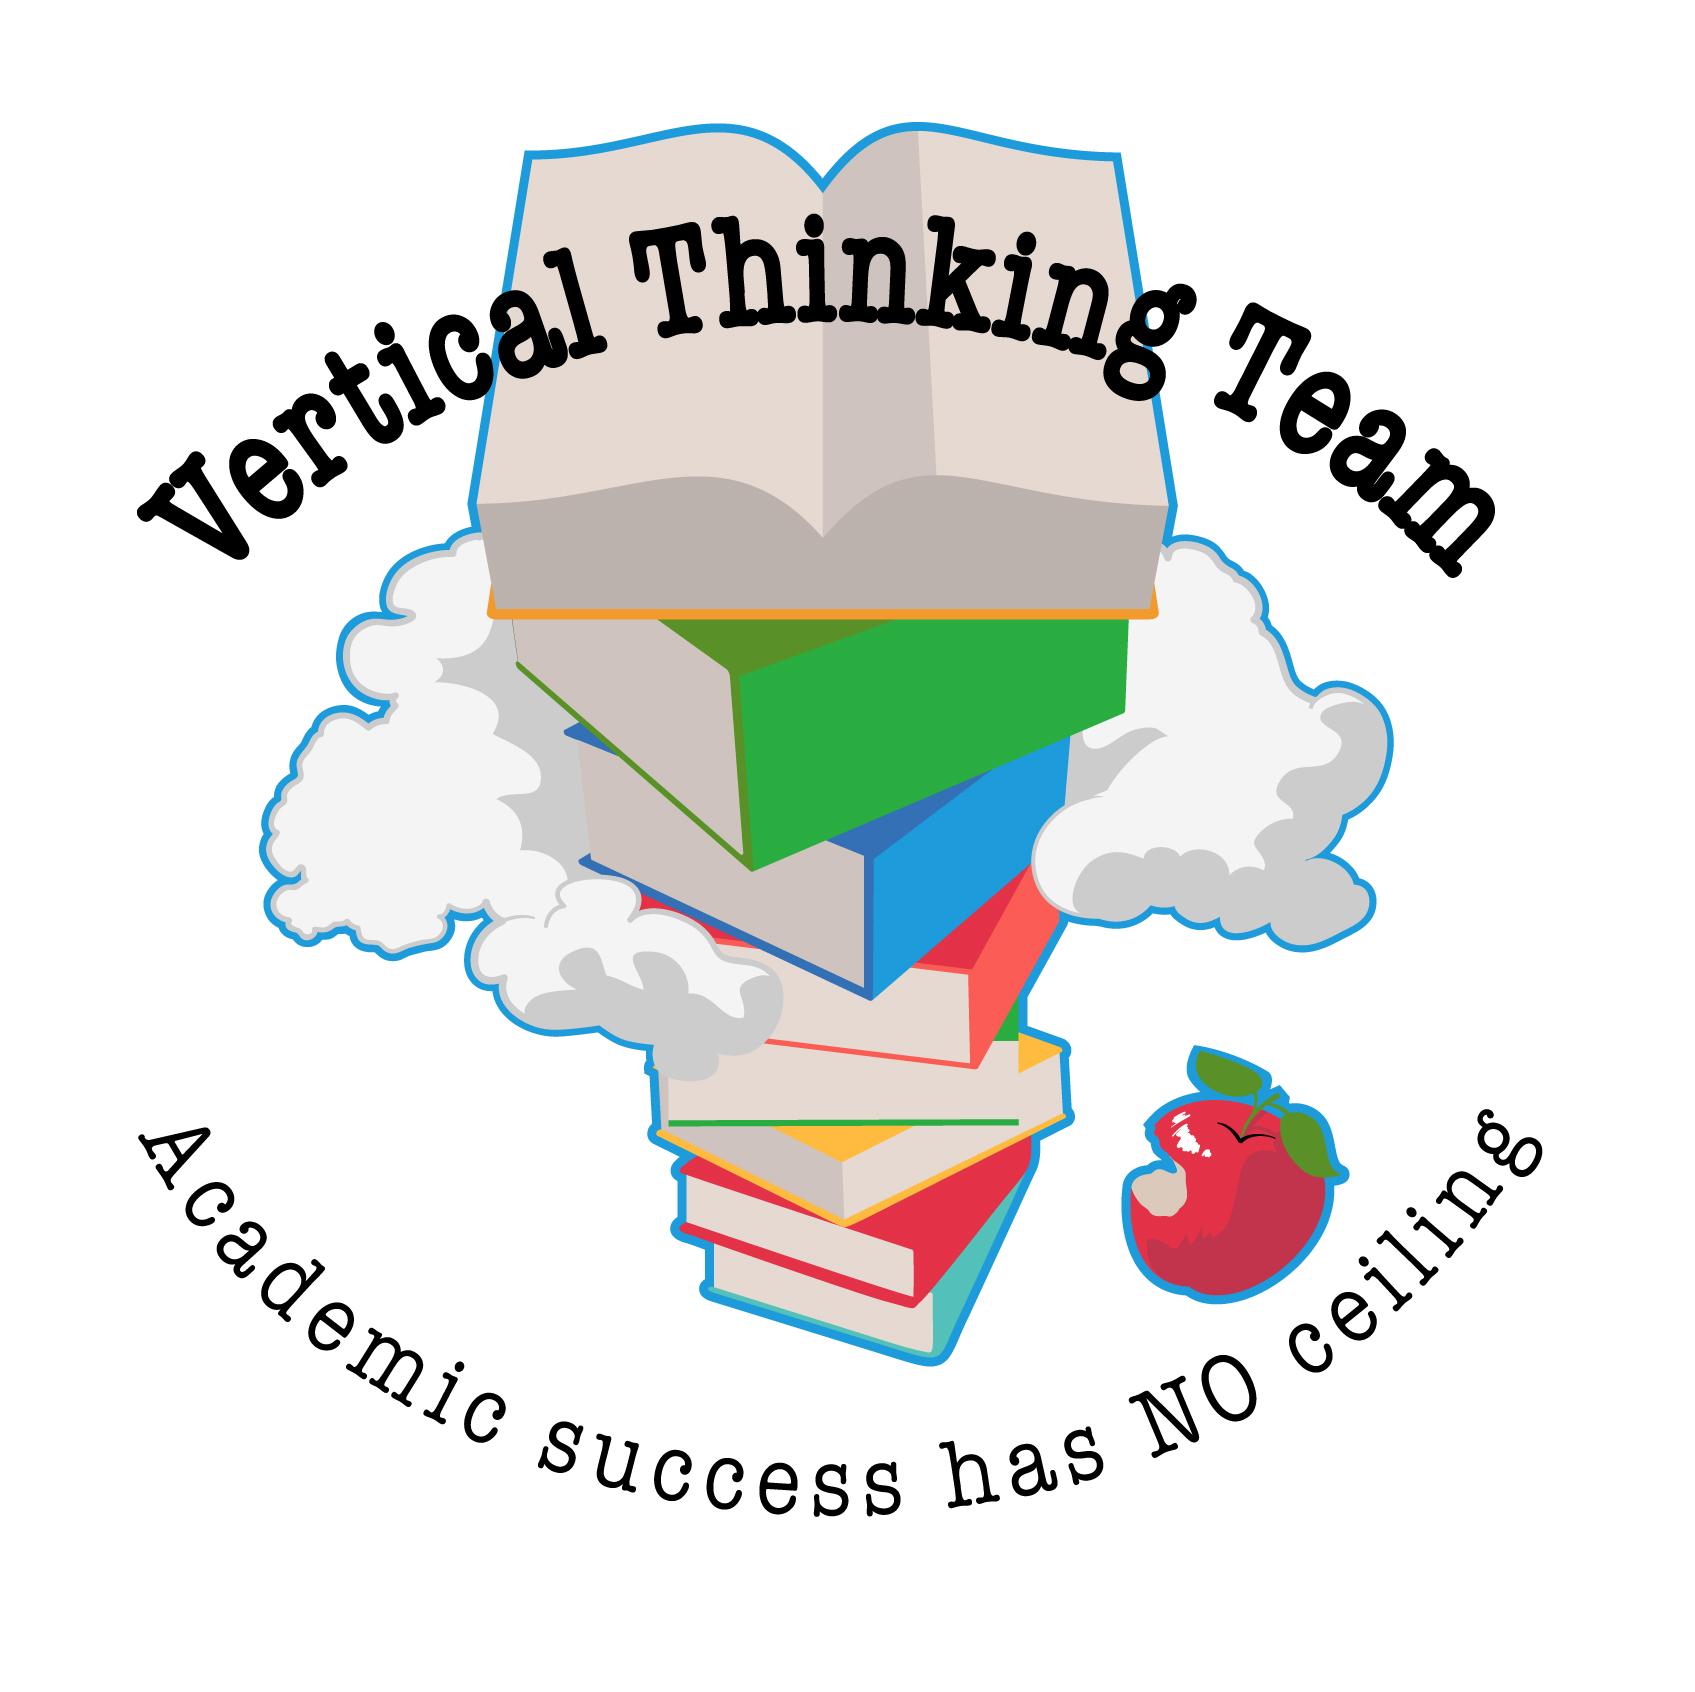 Logo Vertical Thinking Team .jpg